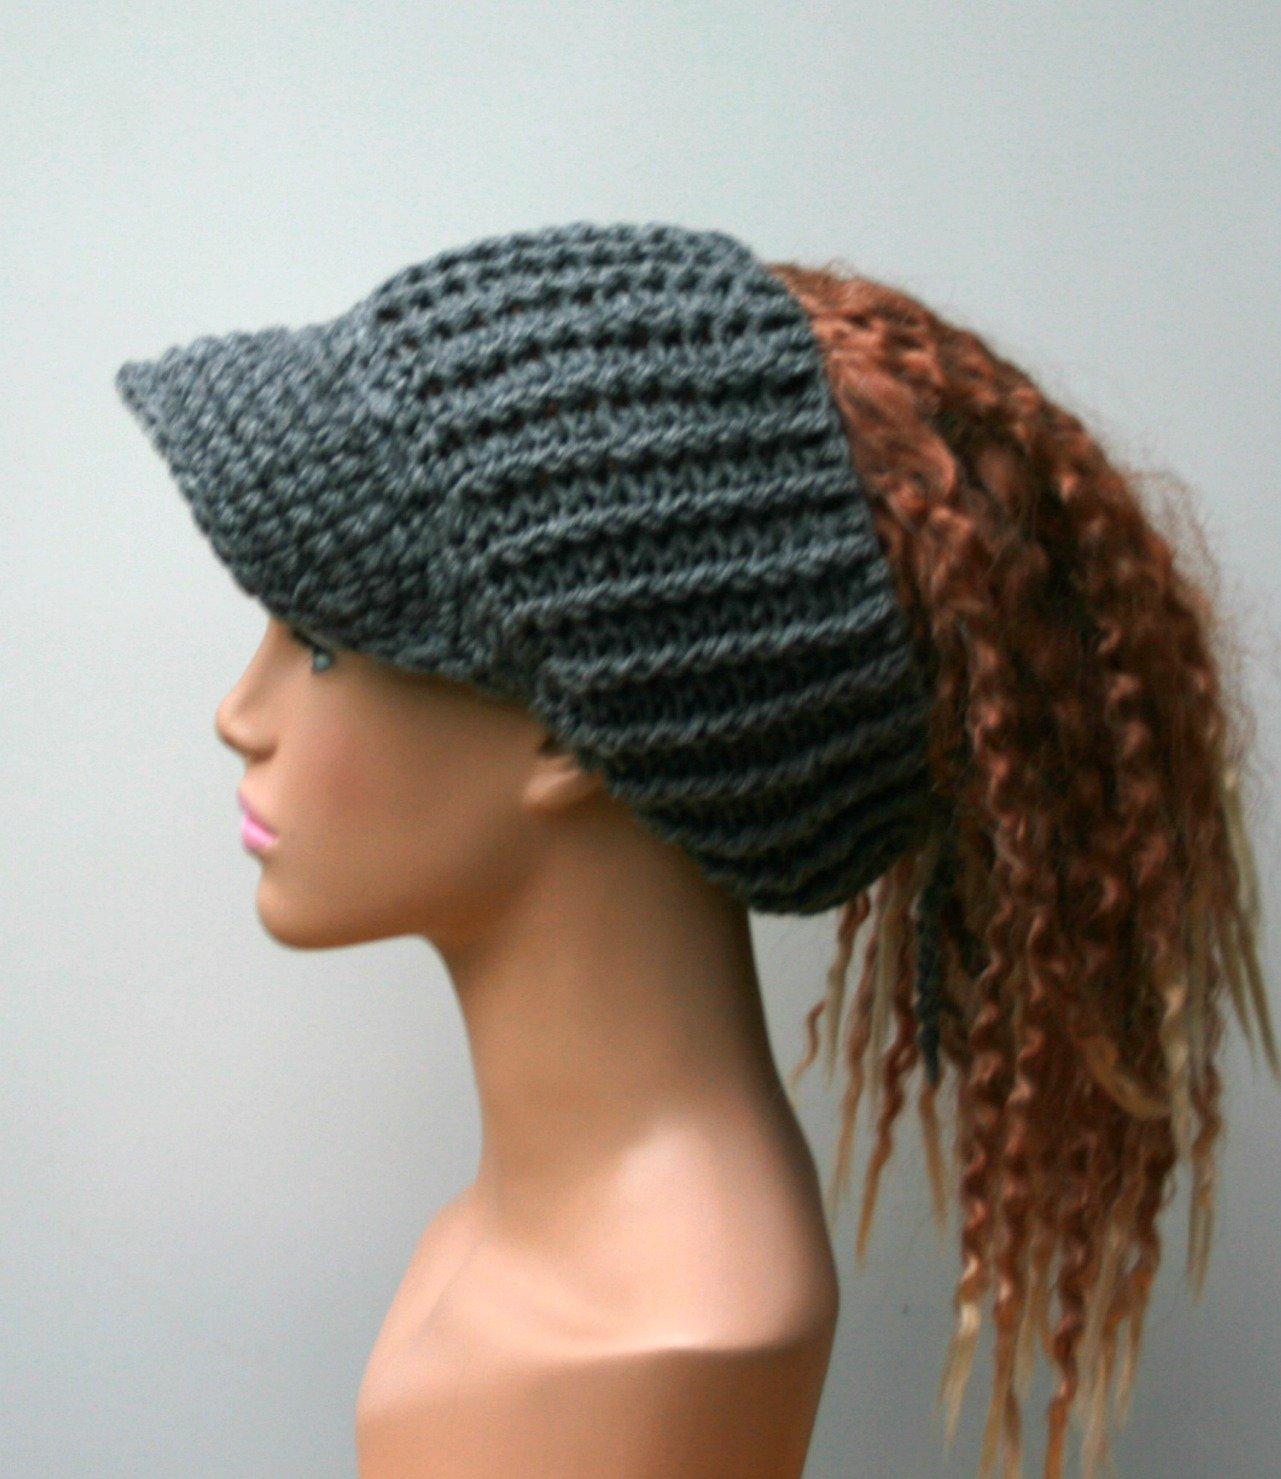 a77e8cd1f Amazon.com: HANDMADE heather gray Ponytail hat, Visor Dread Tube cap ...